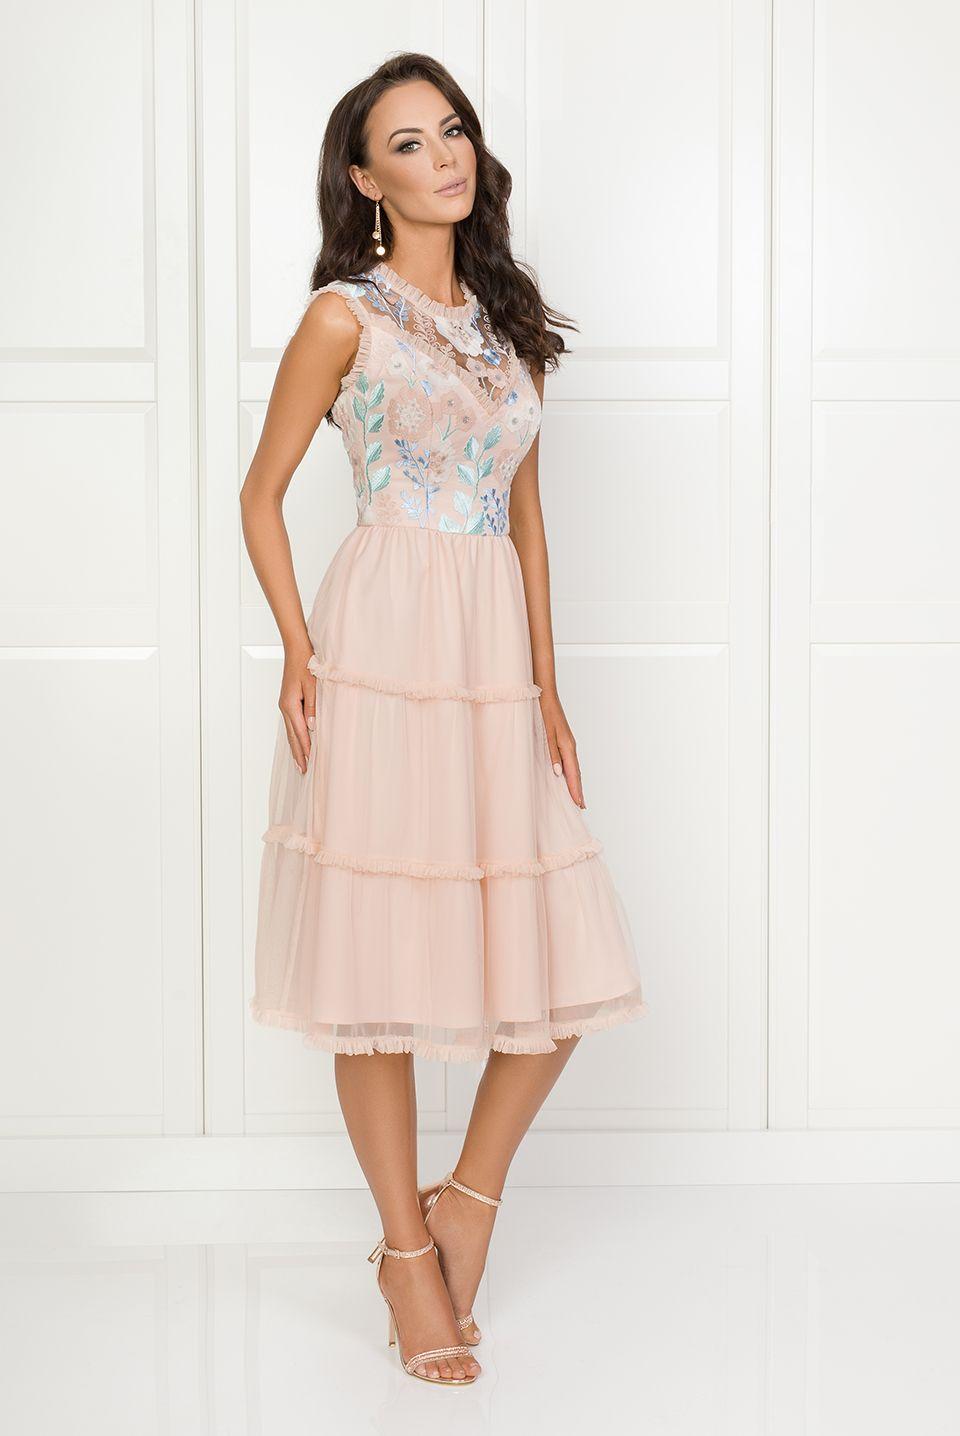 095e06faa6 Emma - Brzoskwiniowa sukienka midi